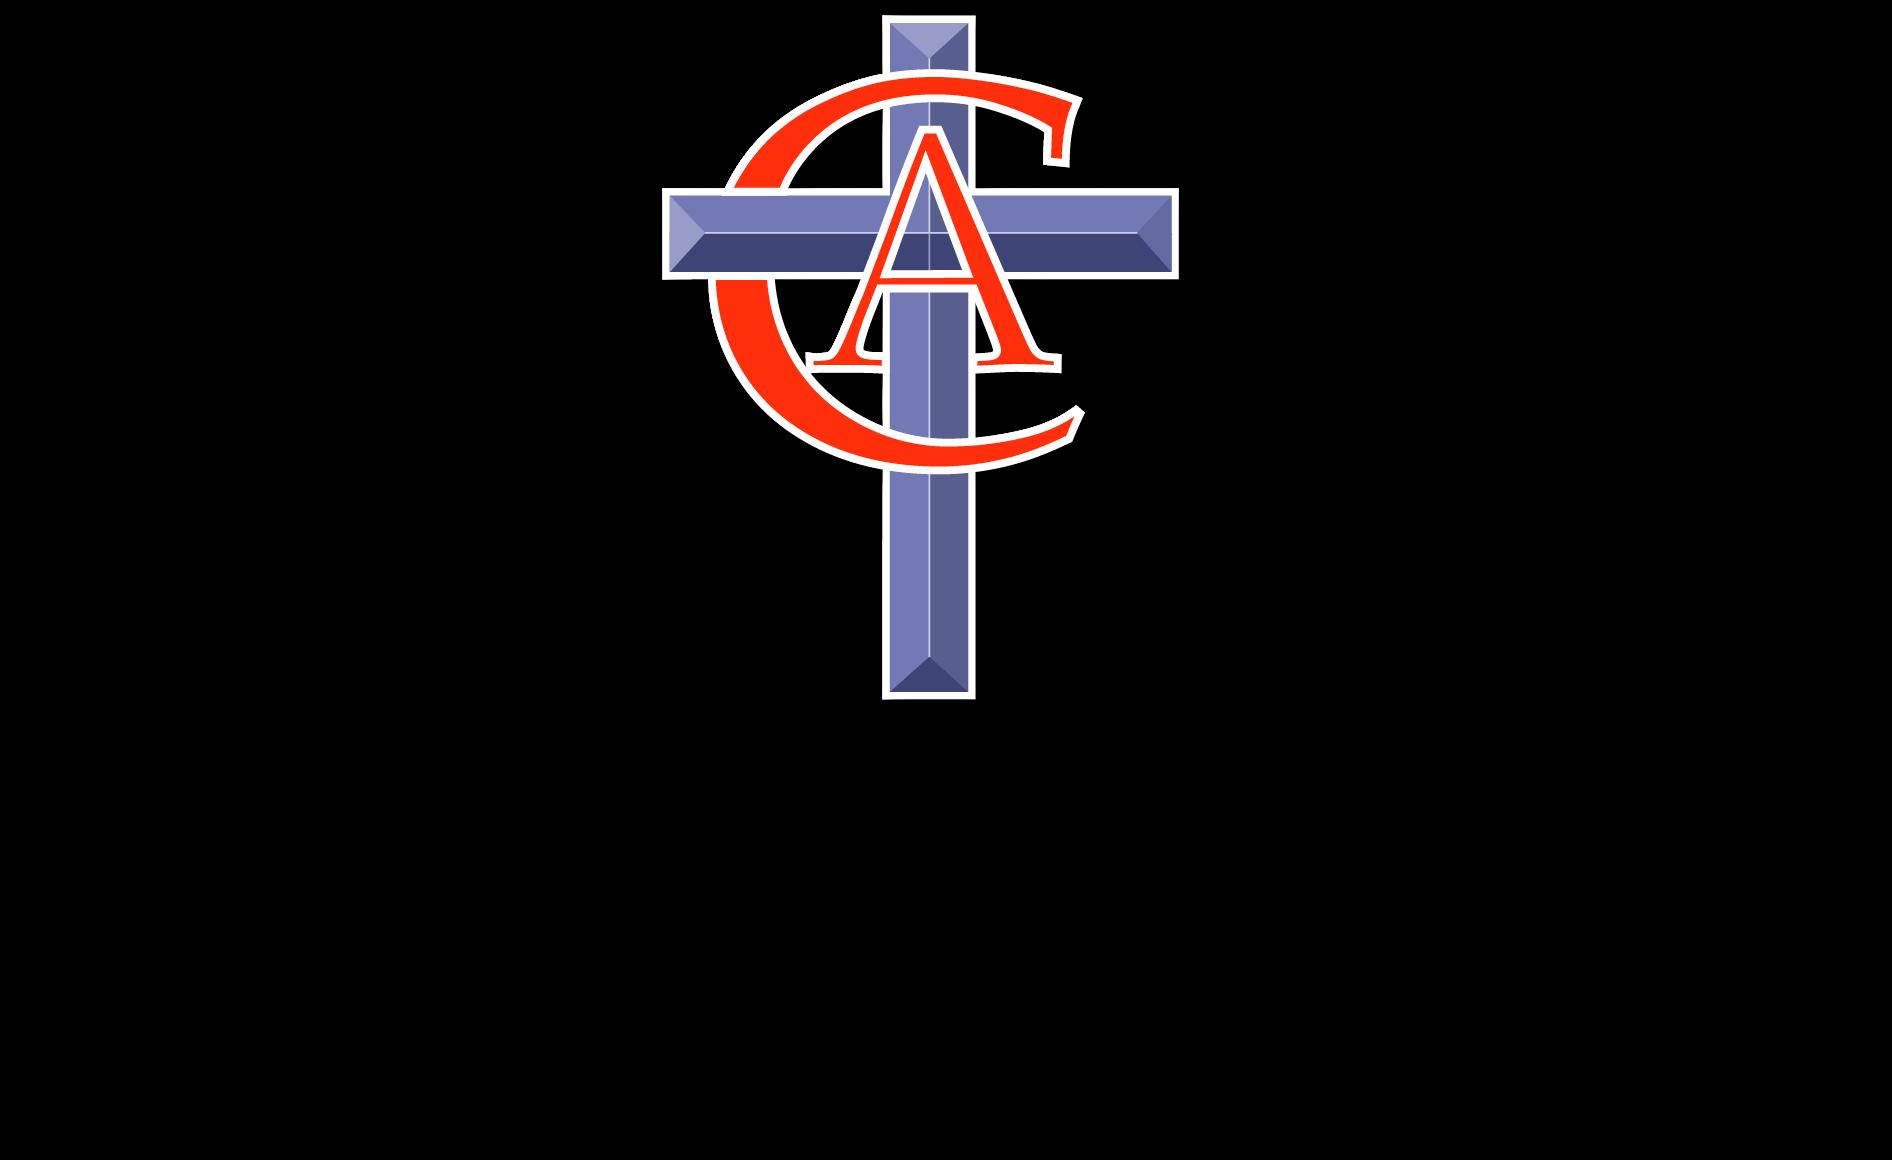 Transparent academy clipart - School System - Christian Academy School System